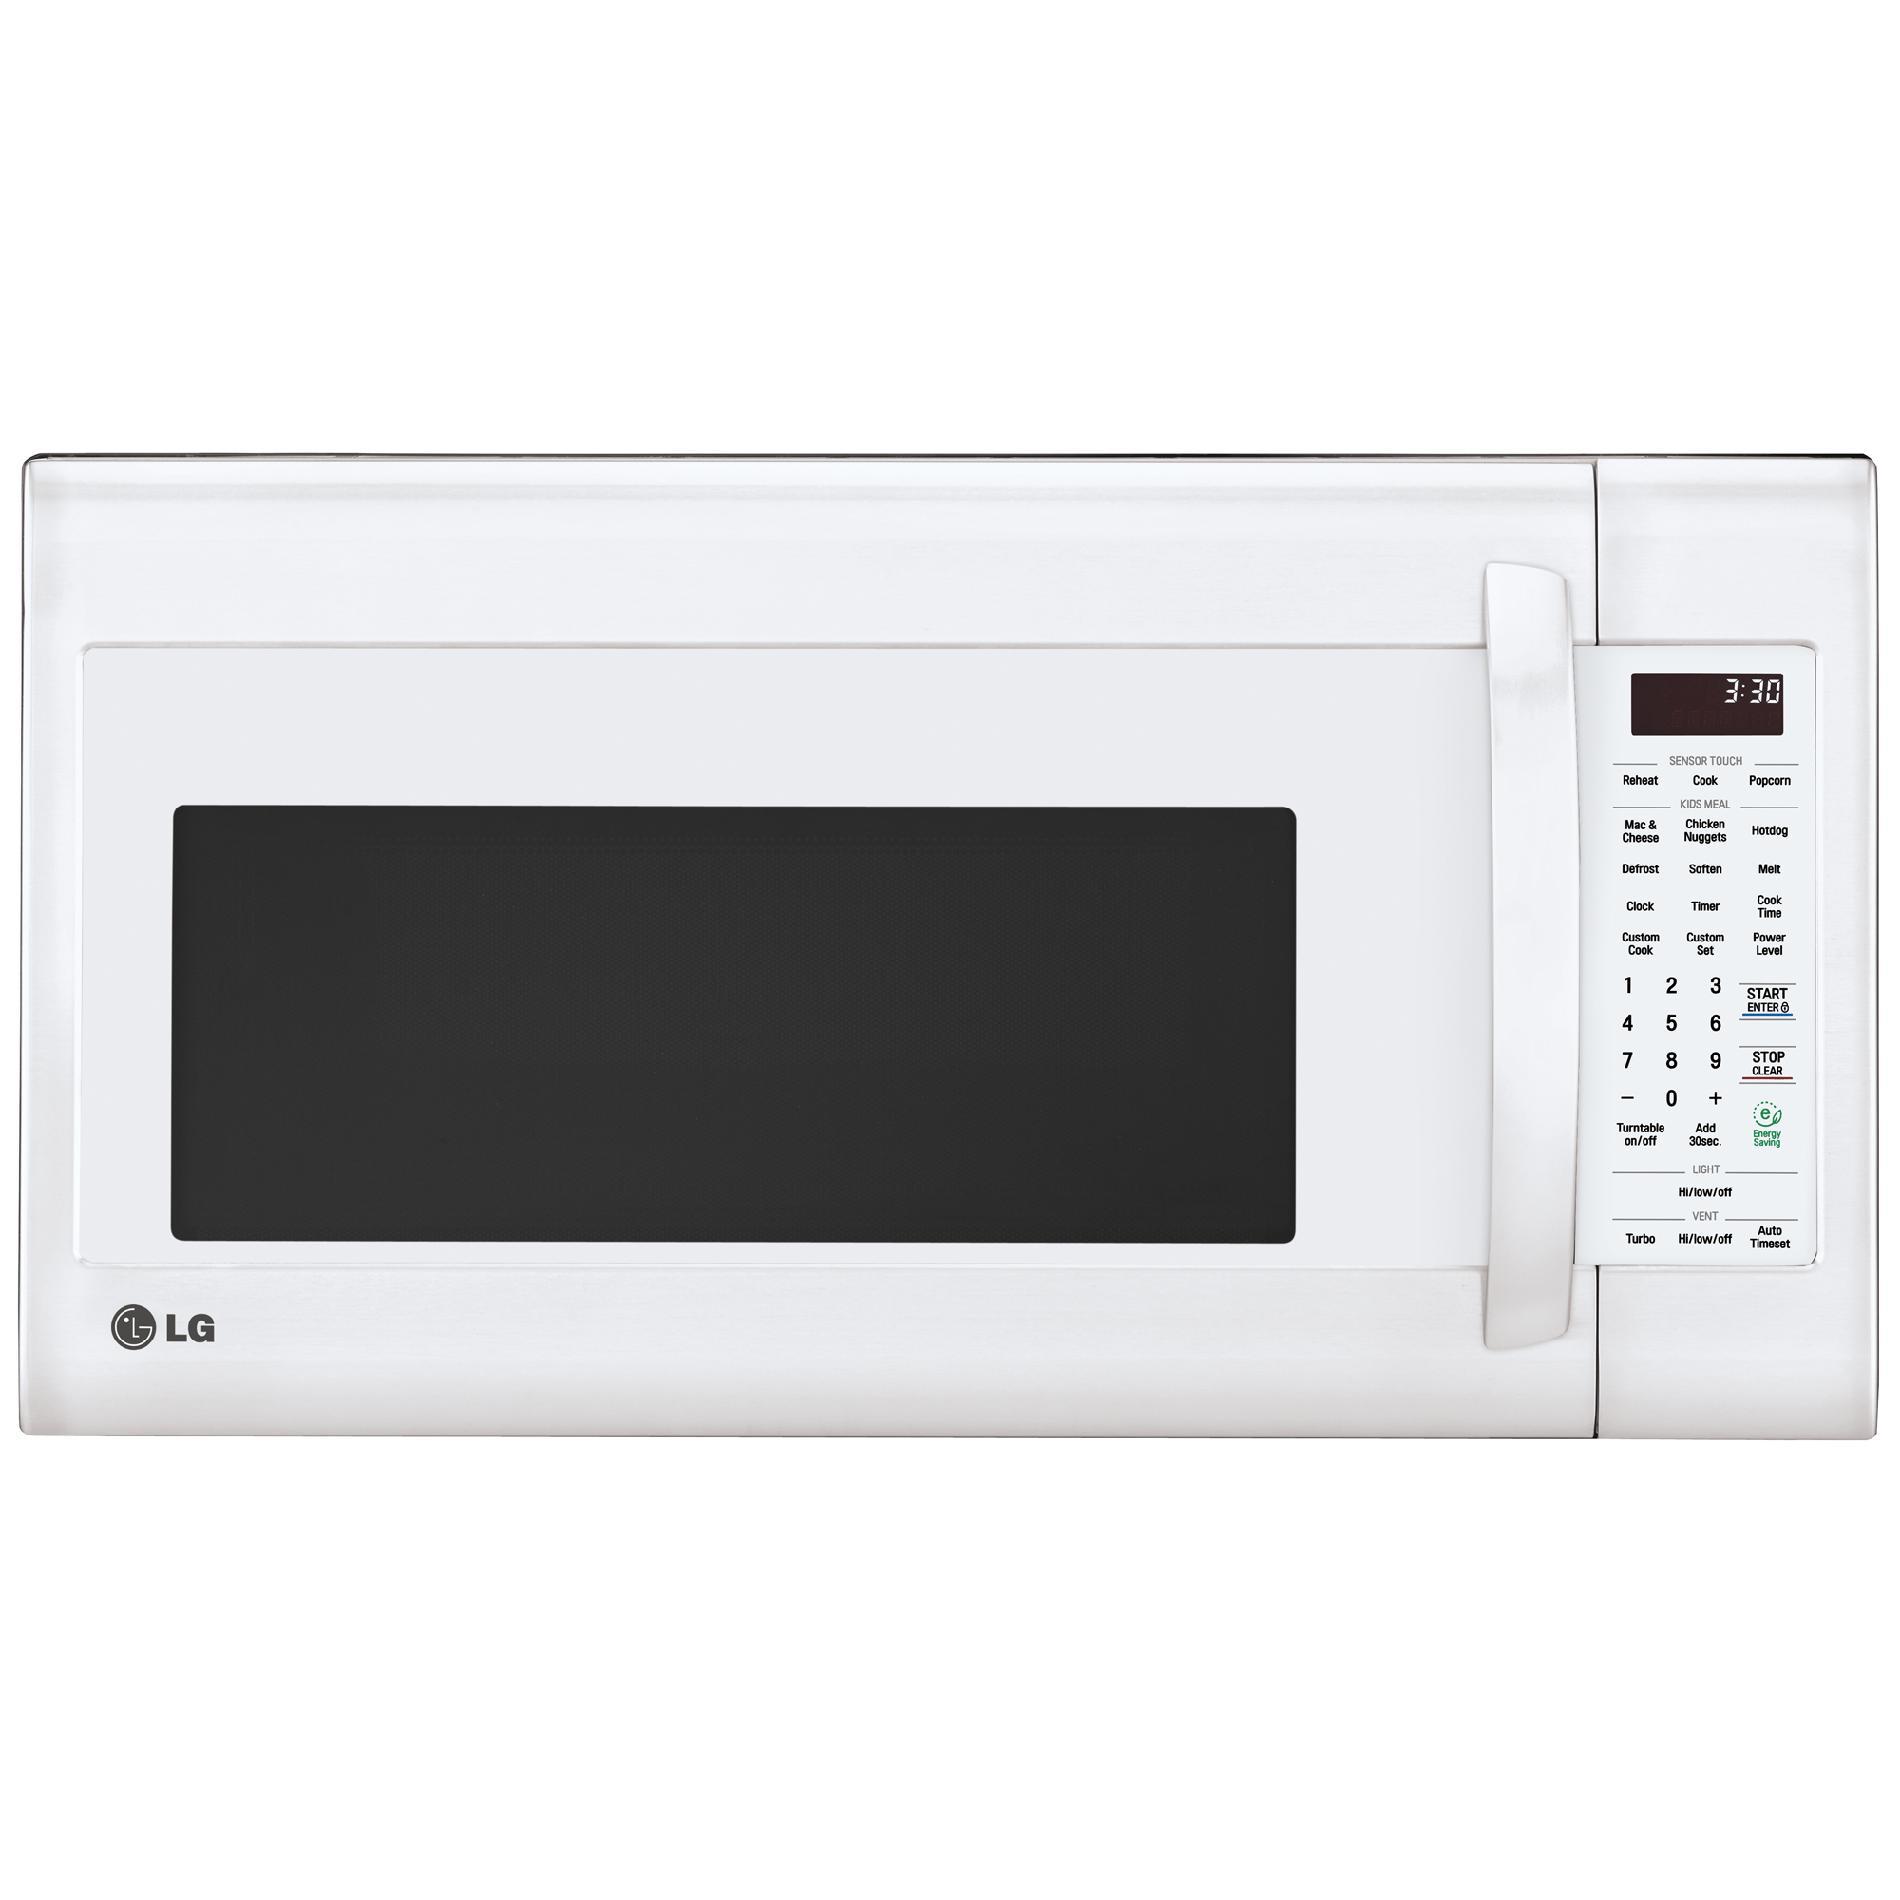 Lg Lmv2031sw 2 0 Cu Ft Over The Range Microwave White Over The Range Microwaves Microwave White Microwave